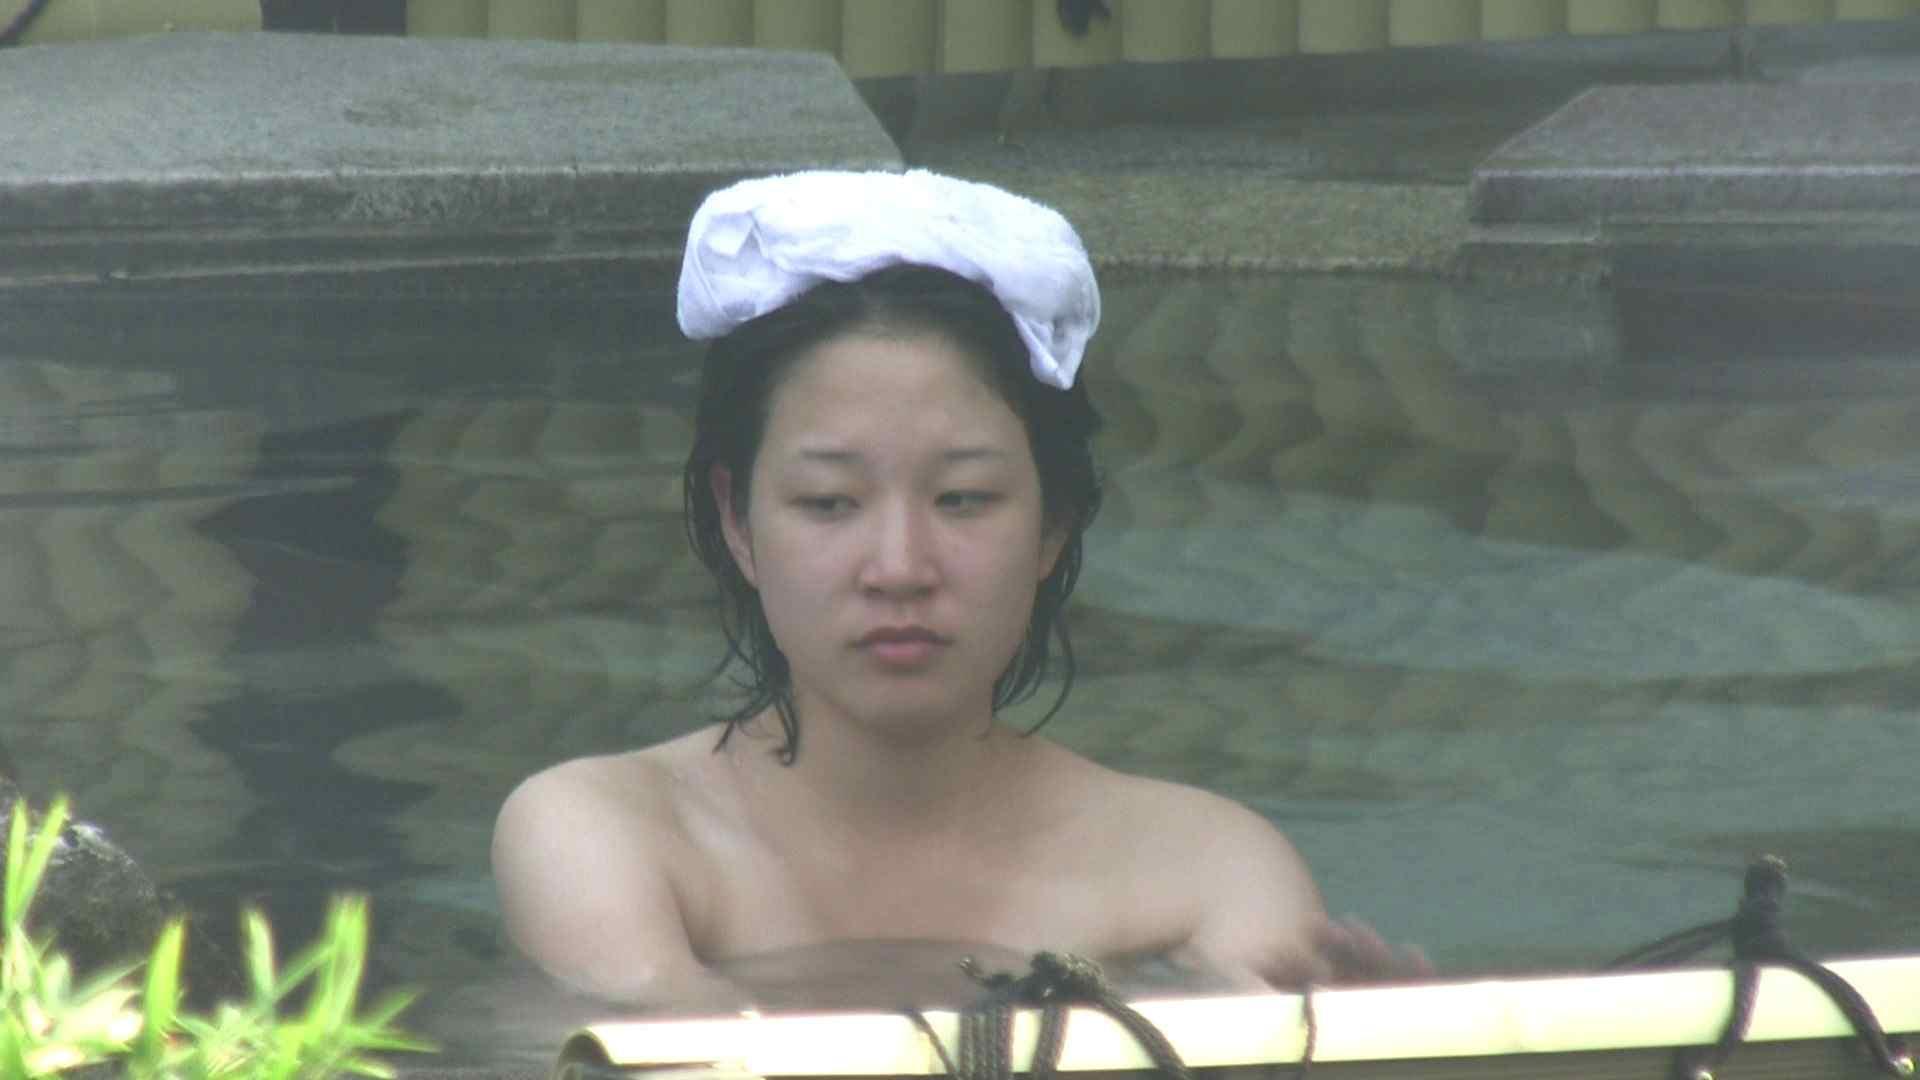 Aquaな露天風呂Vol.172 盗撮映像  113Pix 104